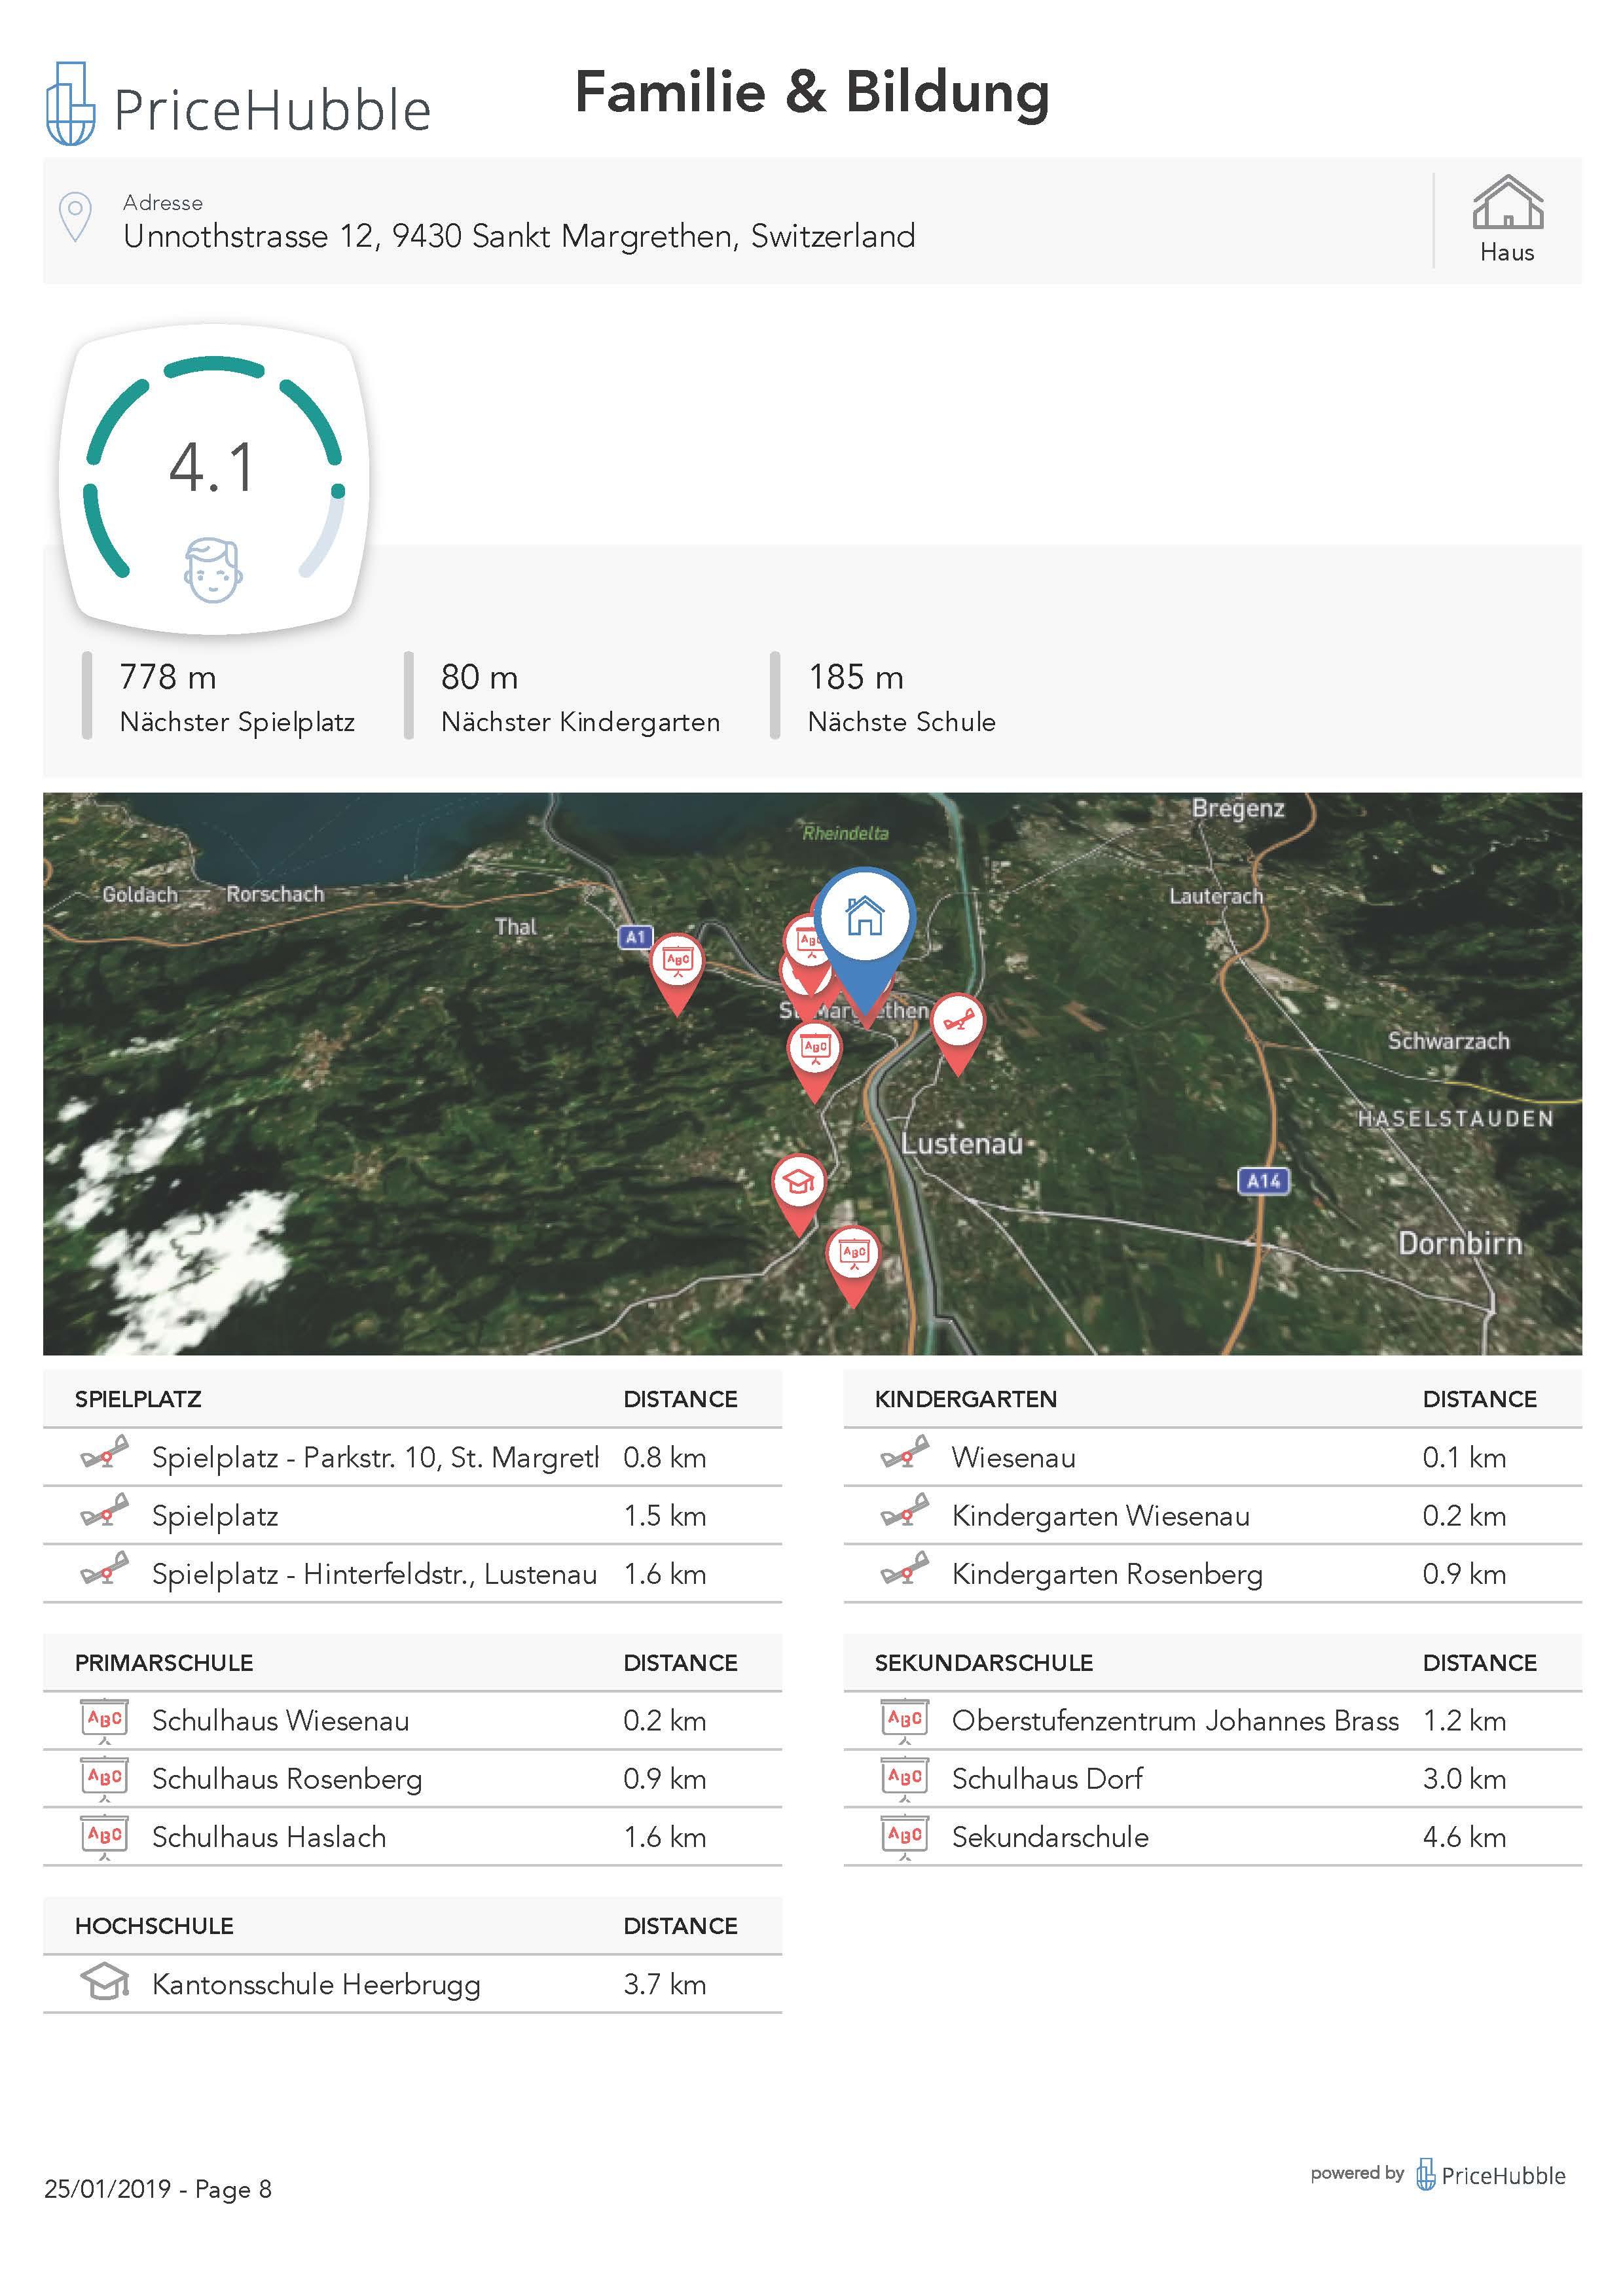 PriceHubble_Valuation_Report_House_Unnothstrasse_12_Sankt-Margrethen_2019-01-25-3_Seite_08.jpg